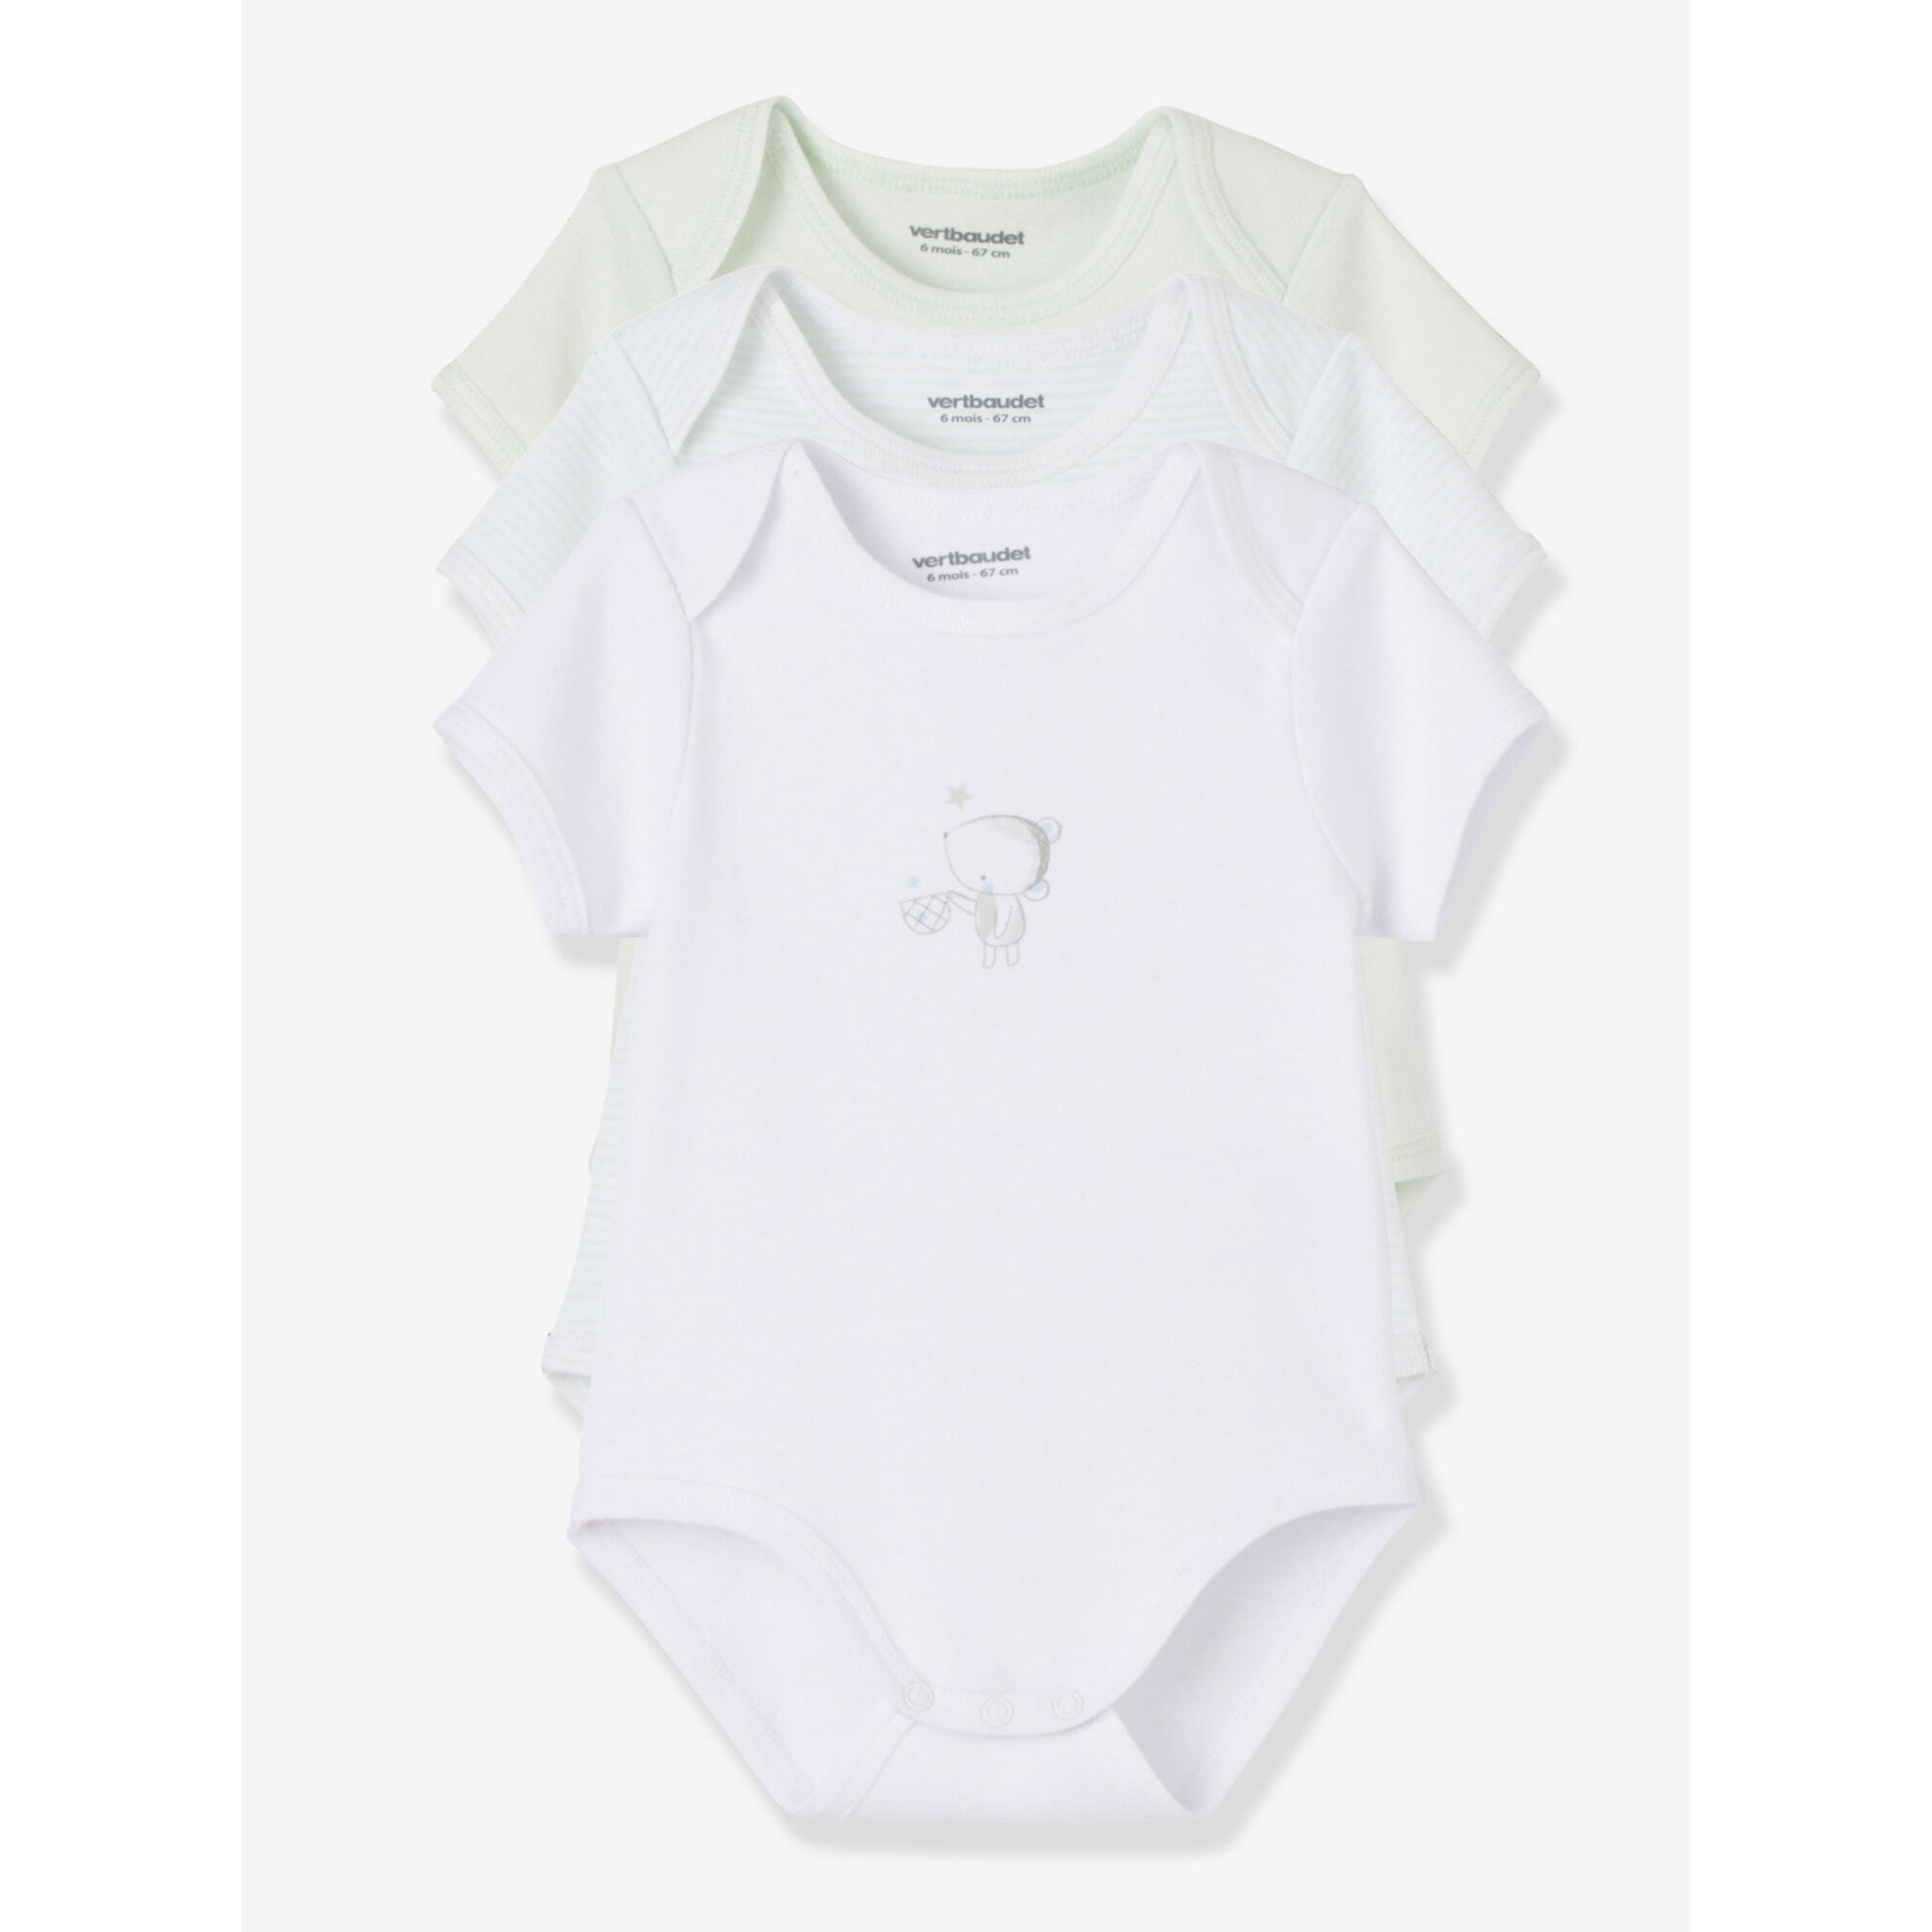 vertbaudet-3er-pack-bodys-fur-babys-kurze-armel